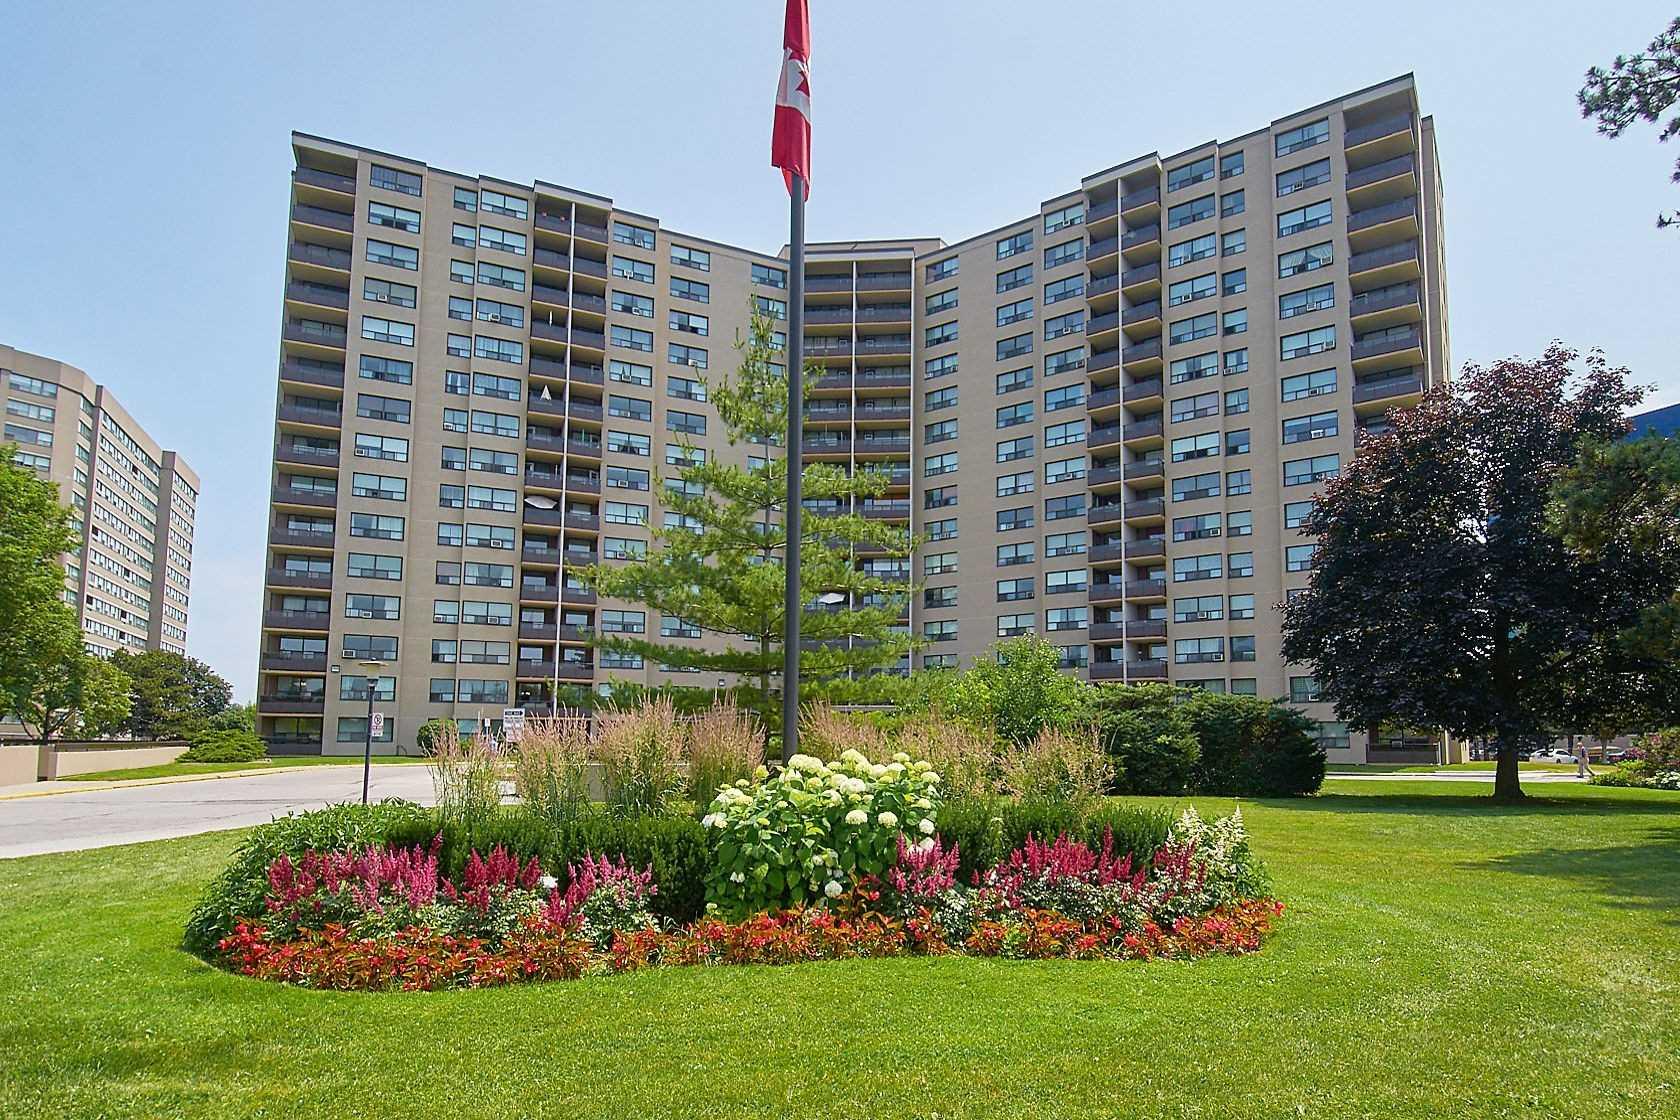 814 - 451 The West Mall, Toronto, M9C1G1